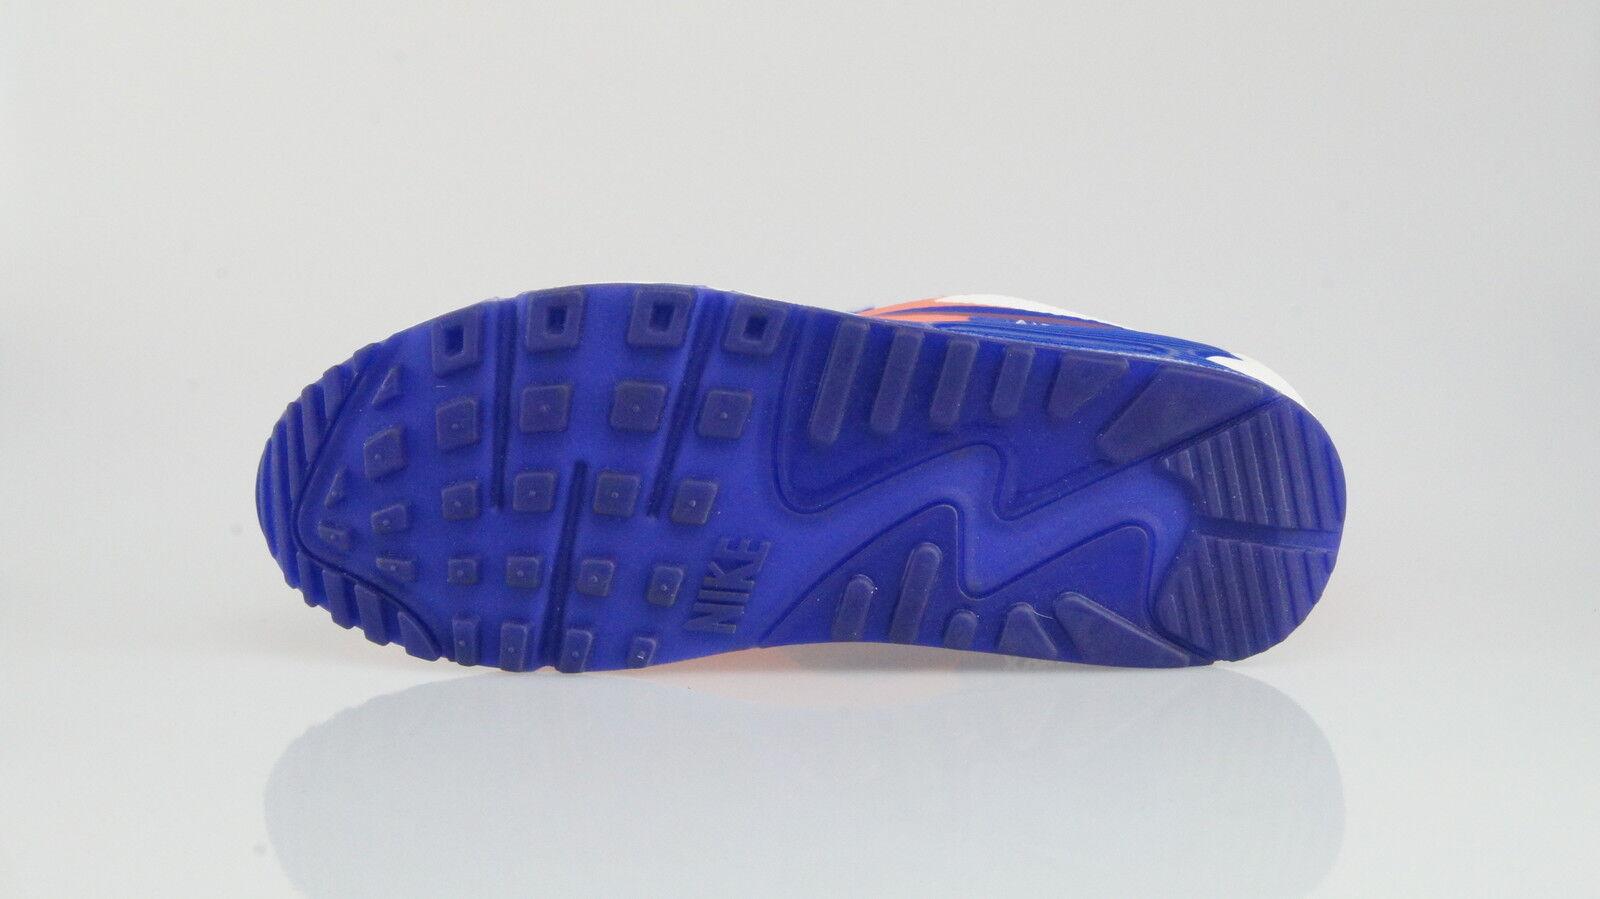 NIKE AIR PRM MAX 90 HYP PRM AIR Size 37,5 (6,5US) f0dcaf